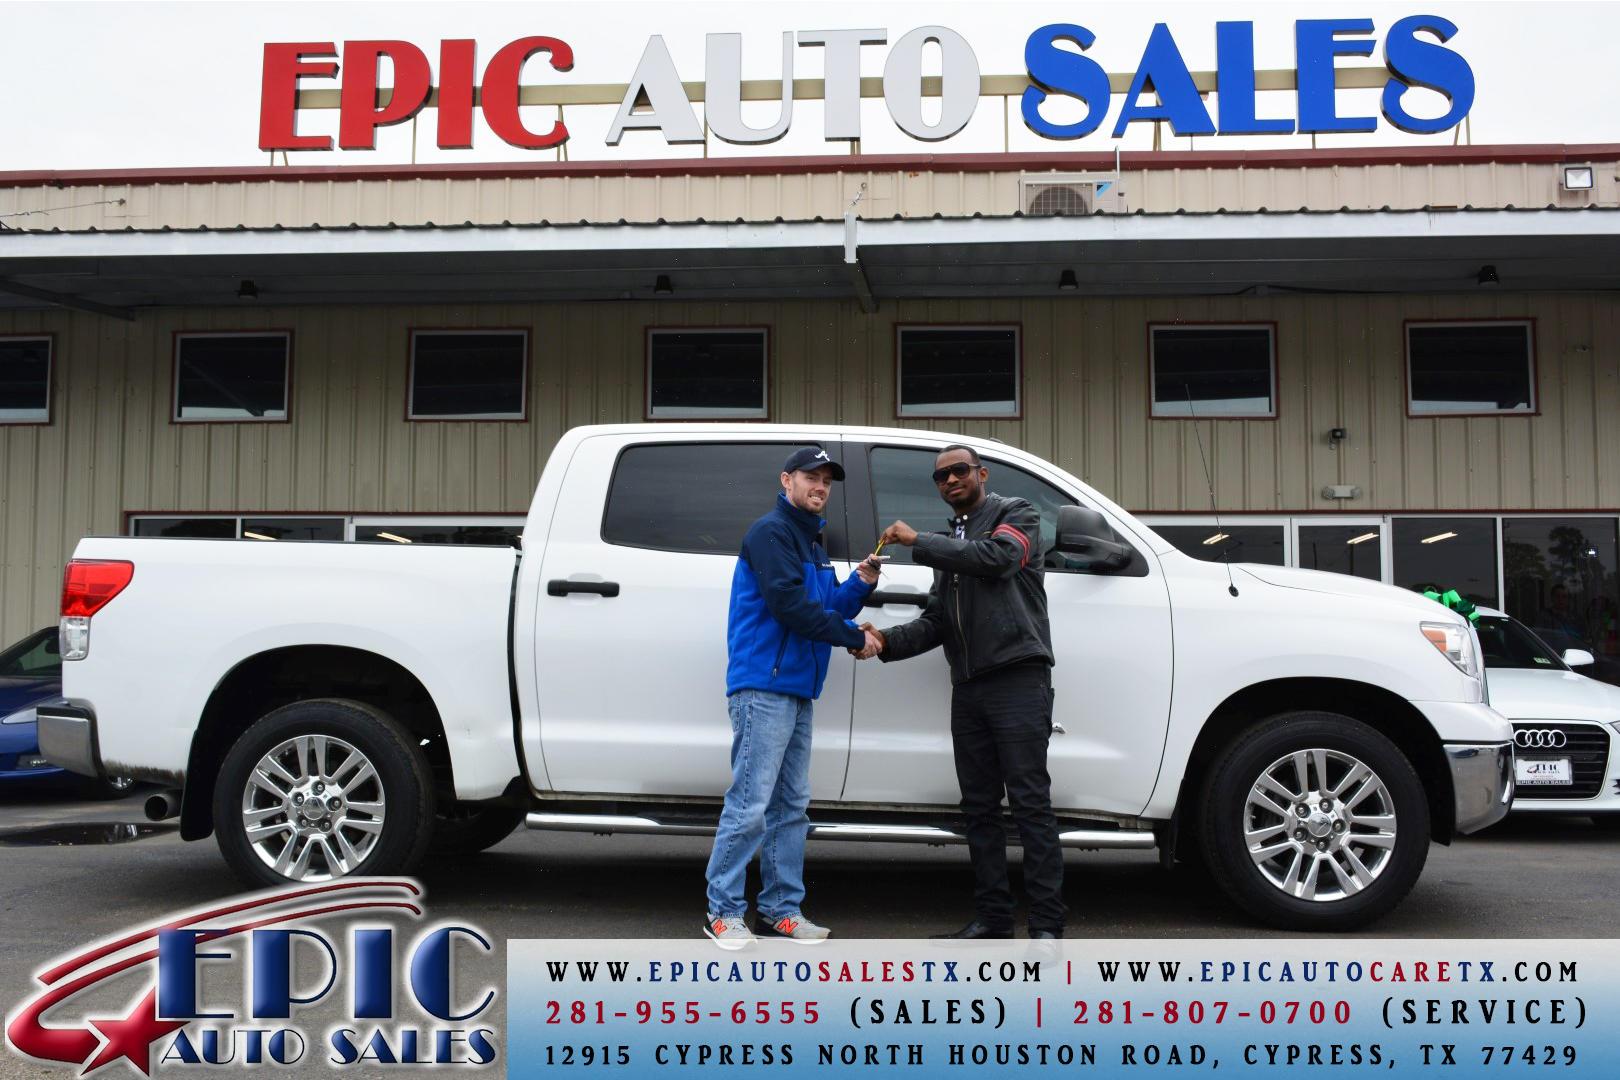 Epic Auto Sales image 19